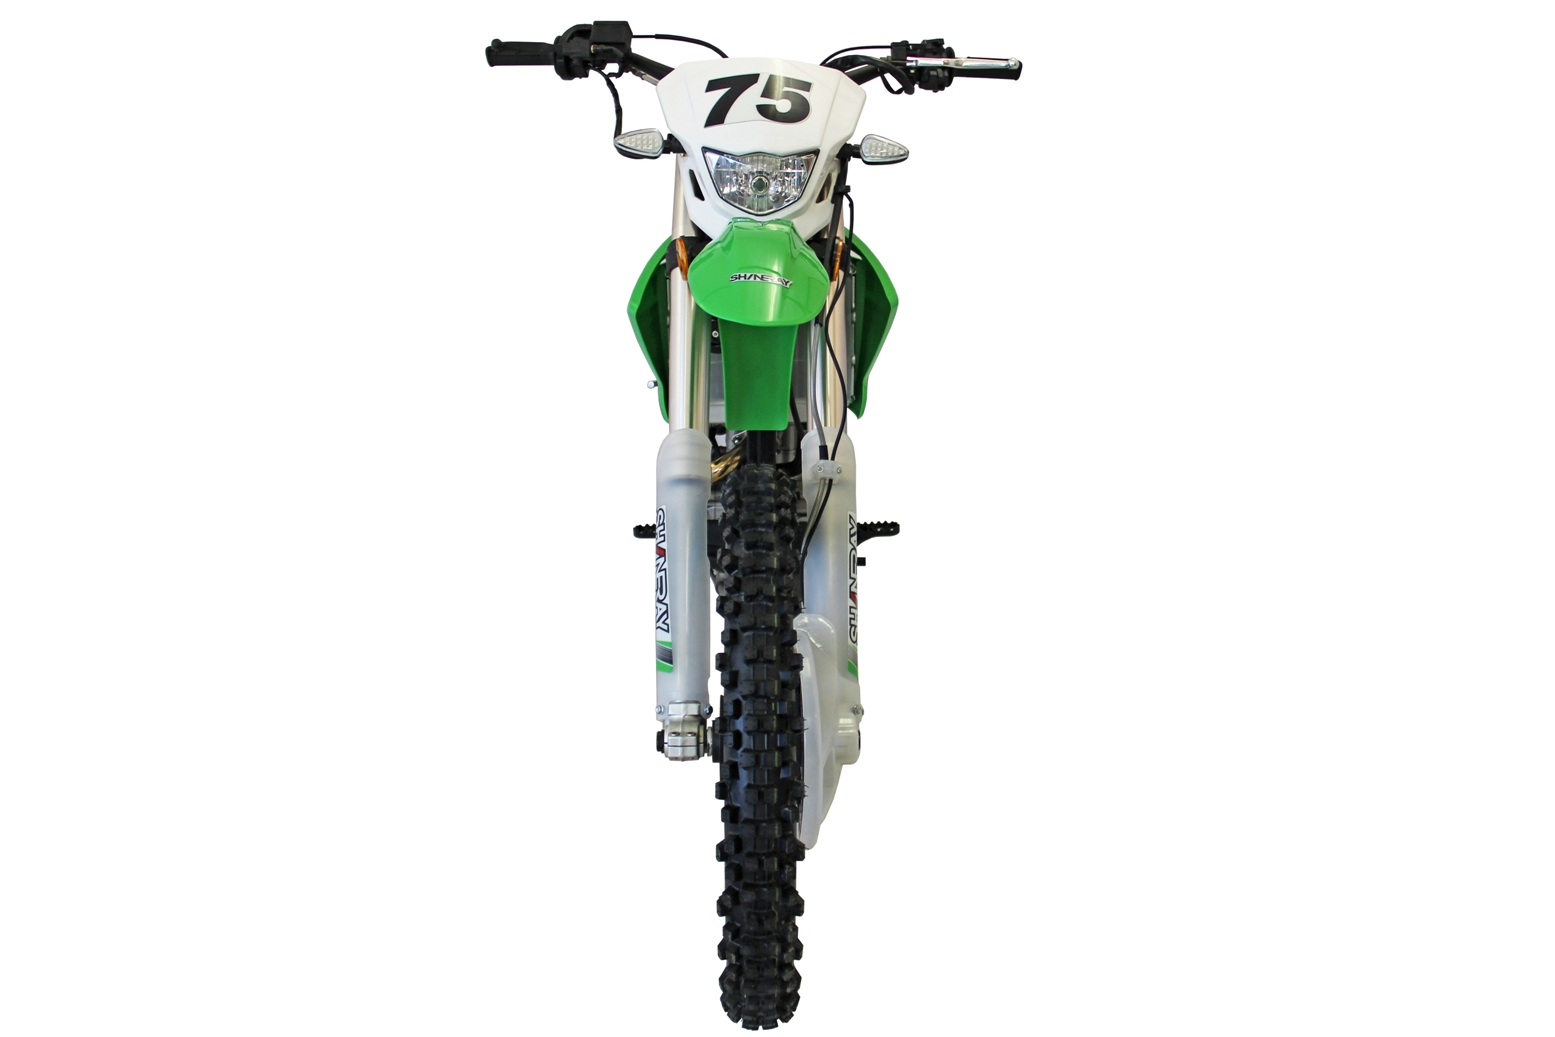 МОТОЦИКЛ SHINERAY XY 250GY-7 (X6) Green ― Артмото - купить квадроцикл в украине и харькове, мотоцикл, снегоход, скутер, мопед, электромобиль